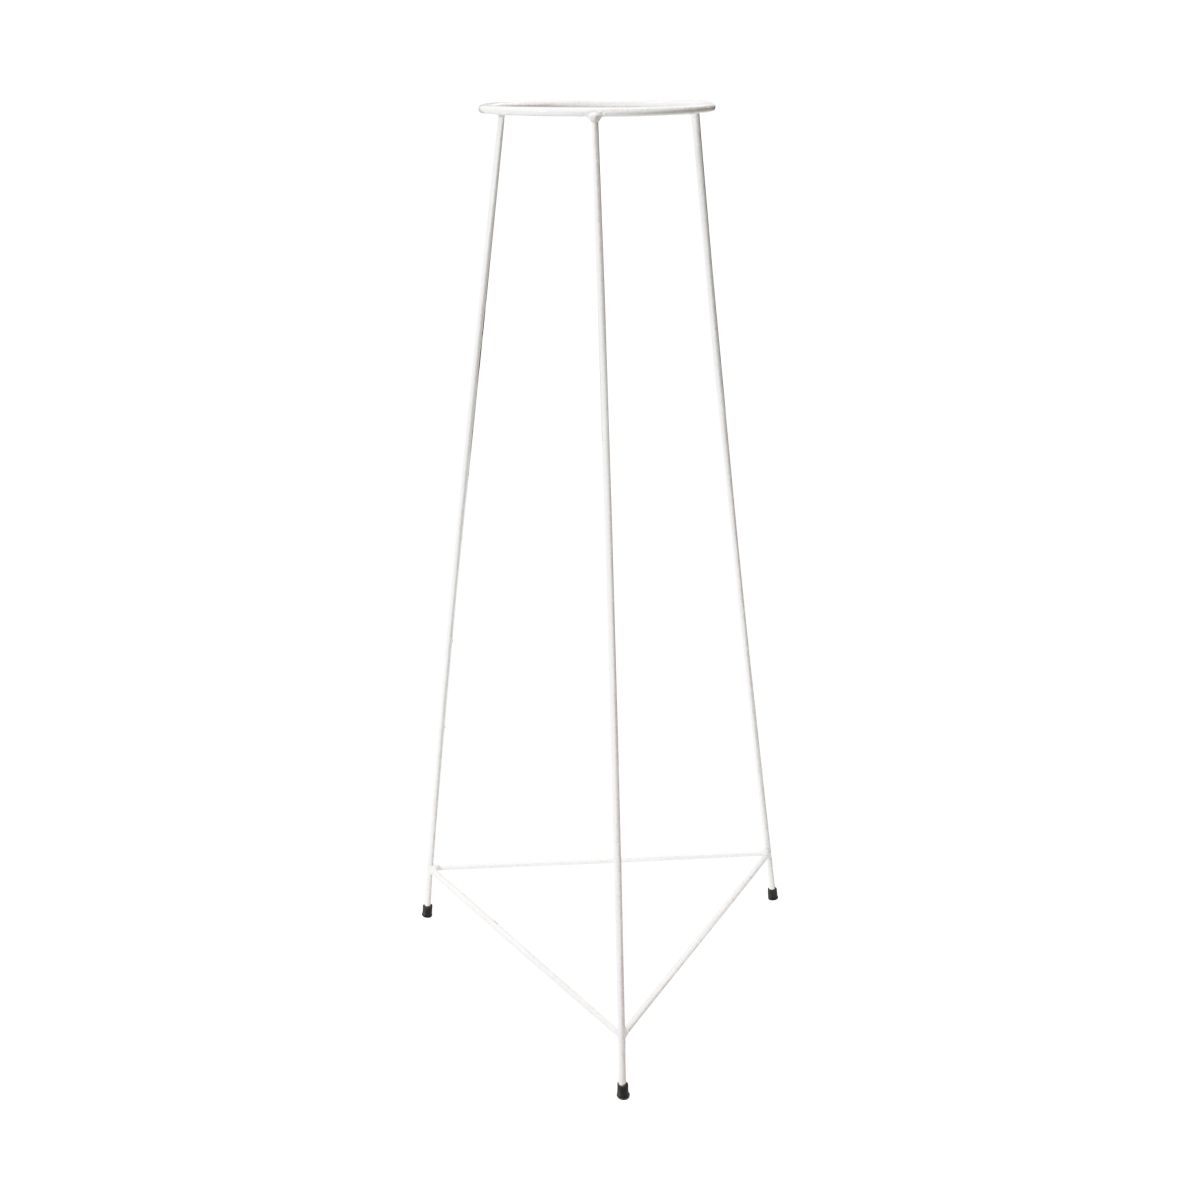 Suporte Tripé Triangular Branco 60cm para Vaso Autoirigável Médio N03 Raiz